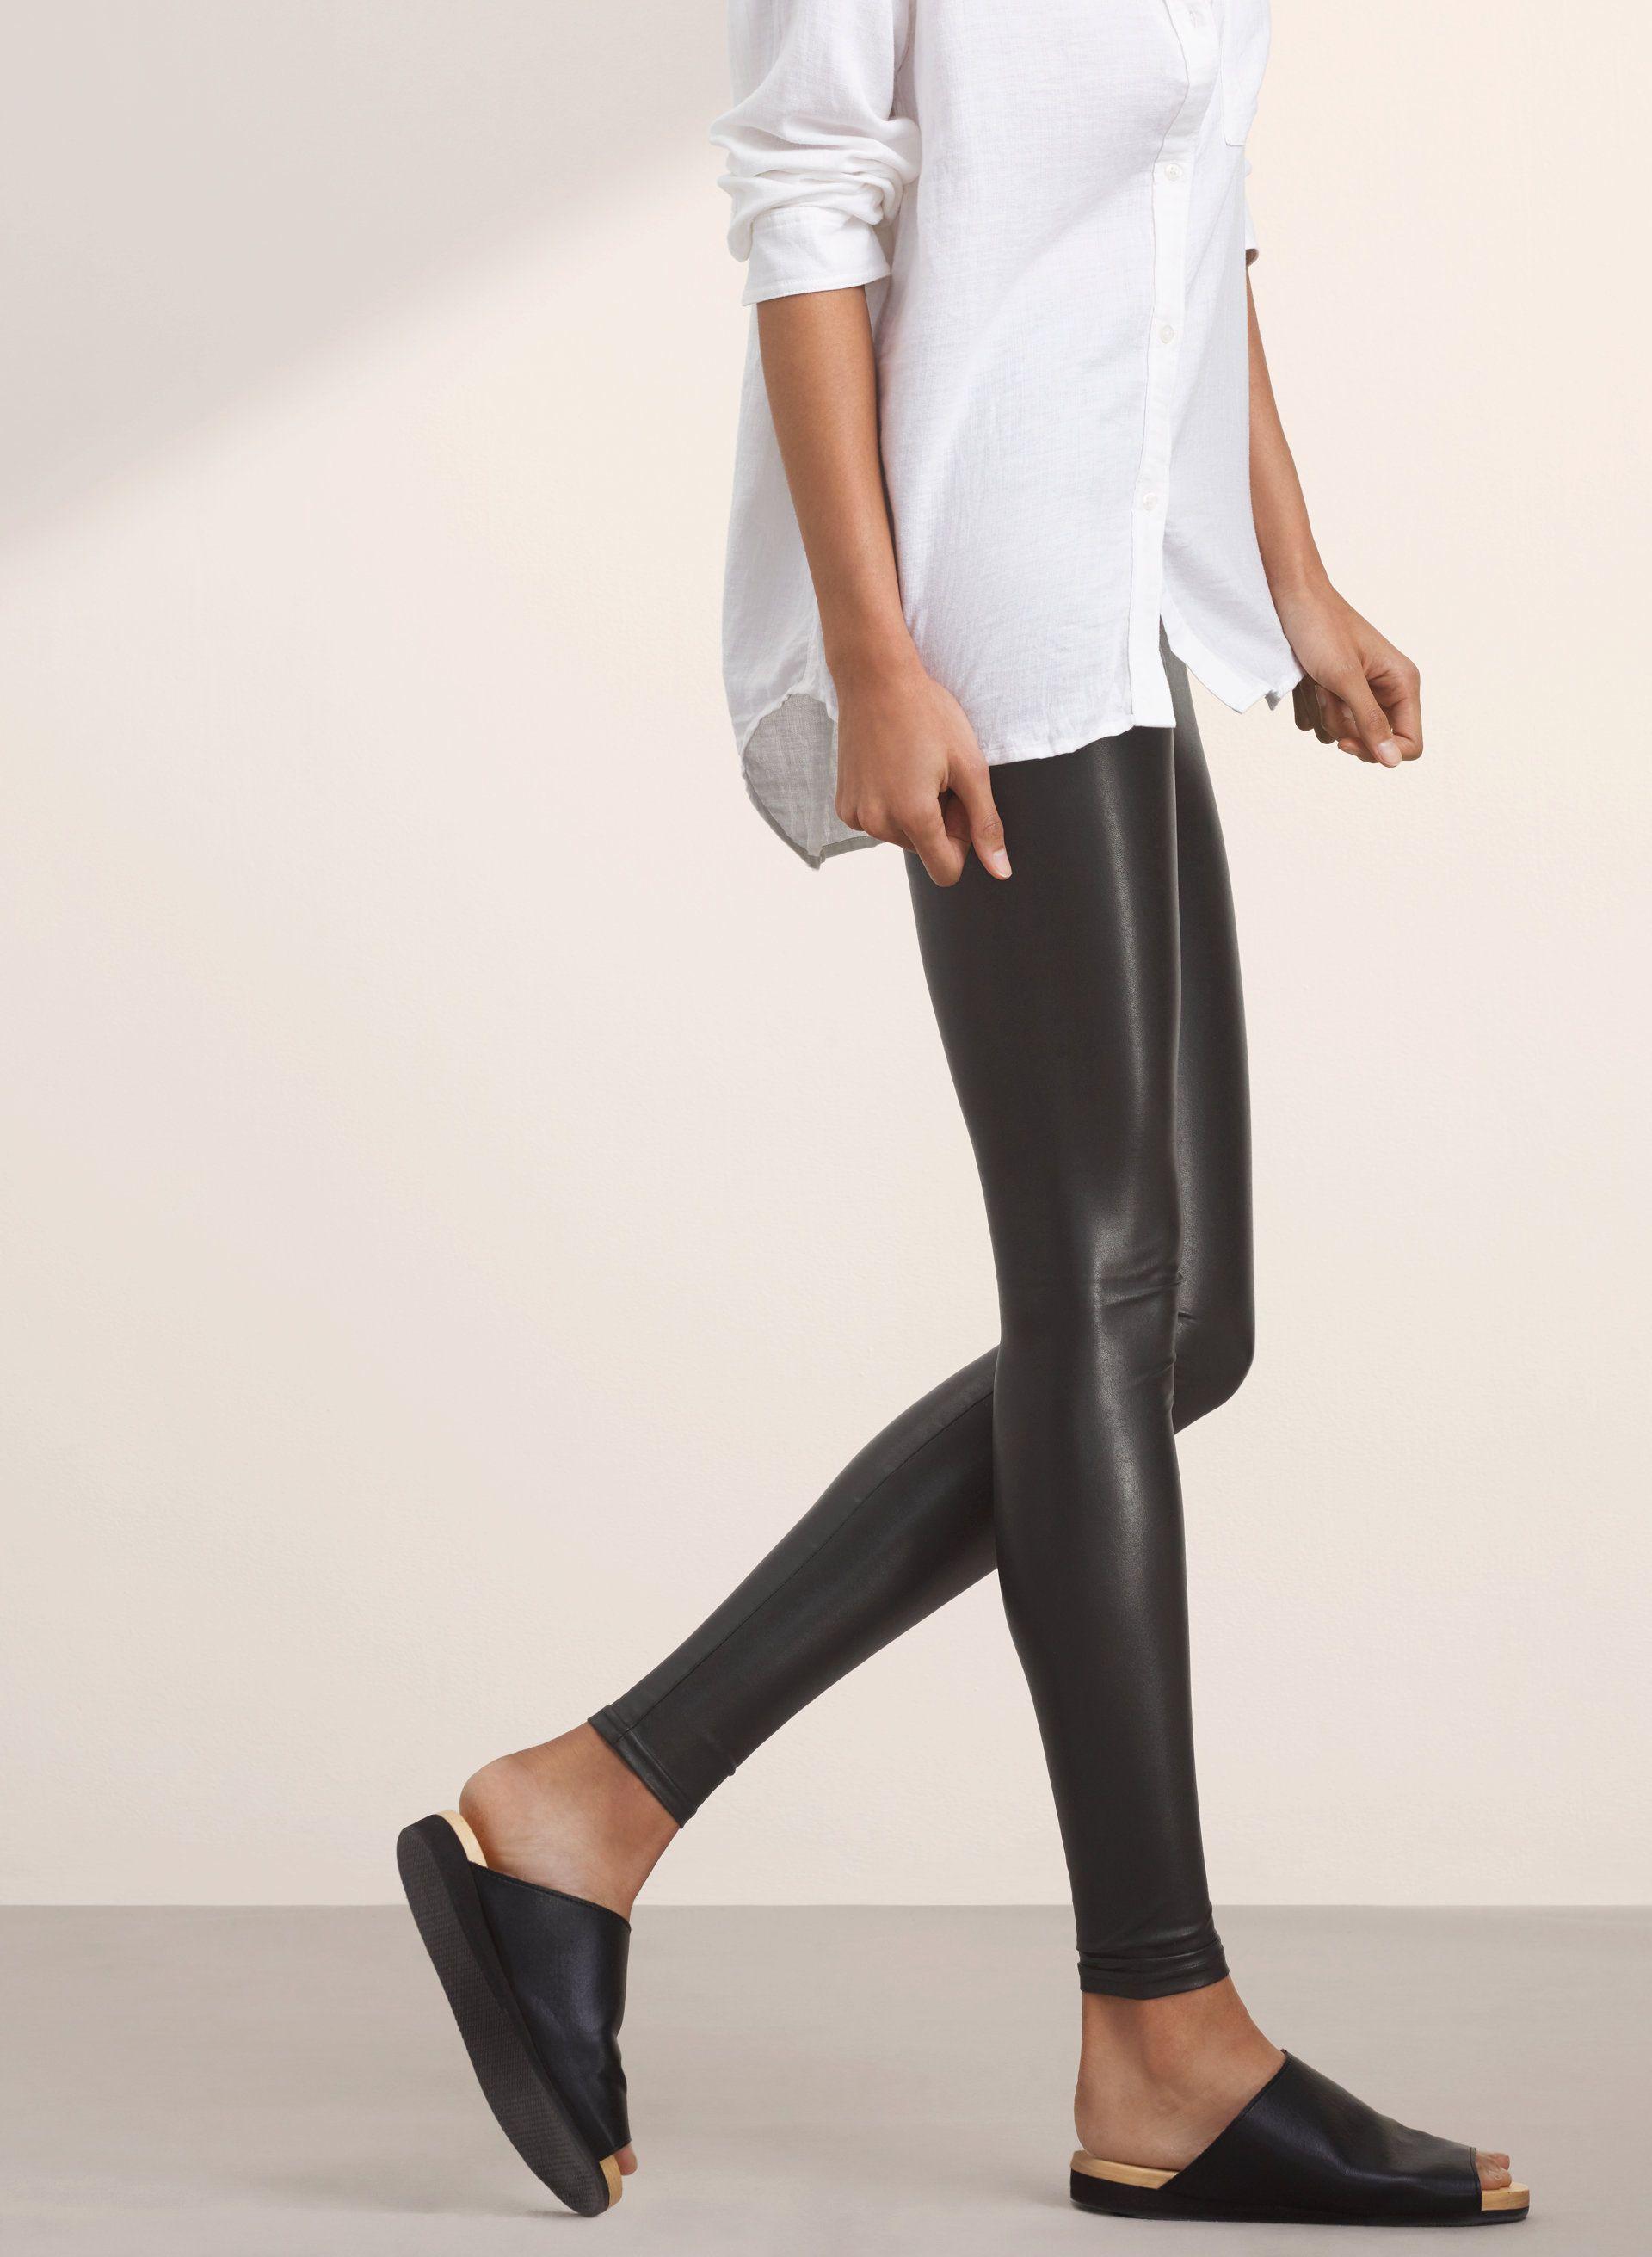 ce8ec002474dd5 Daria pant | Free leggings, Clothes and Fashion. Daria pant. Leather  LeggingsSpring … Aritzia Daria faux ...